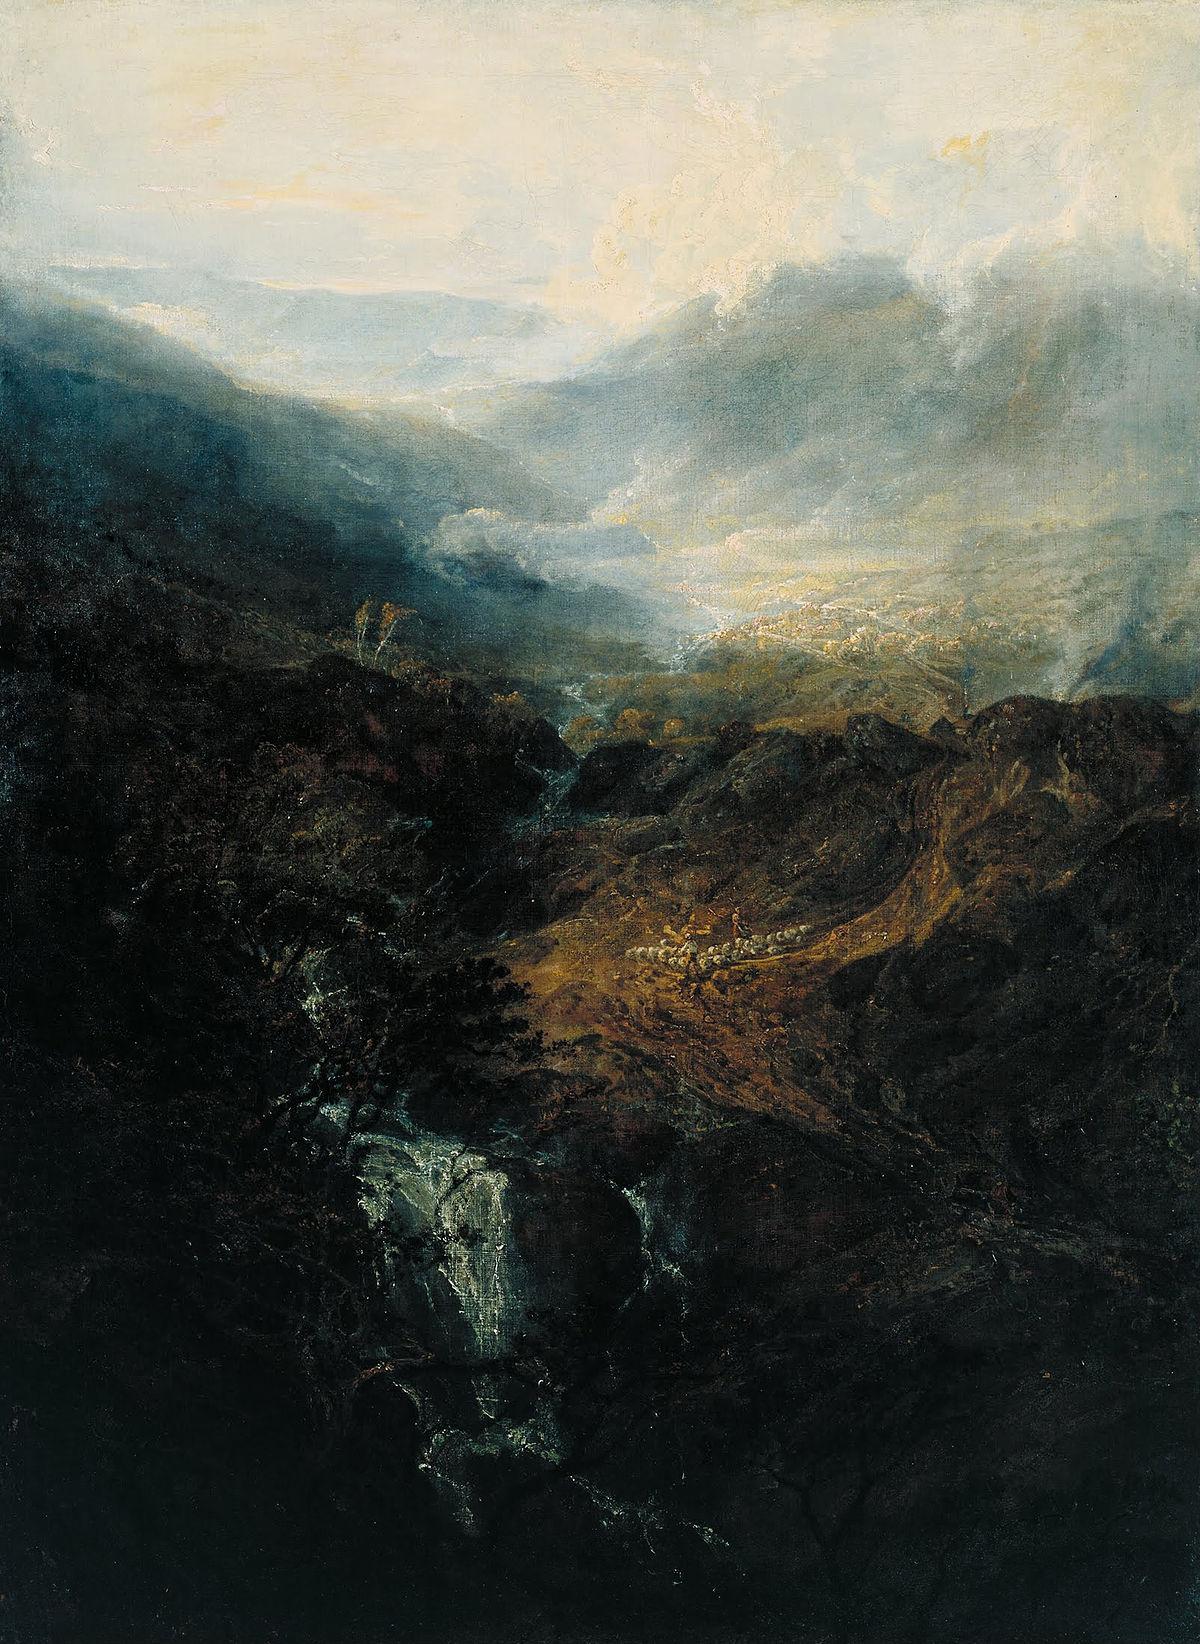 картина < Утро в Корнстонских скалах в Камберленде >:: Уильям Тёрнер ( William Turner ) - Тёрнер Уйльям фото